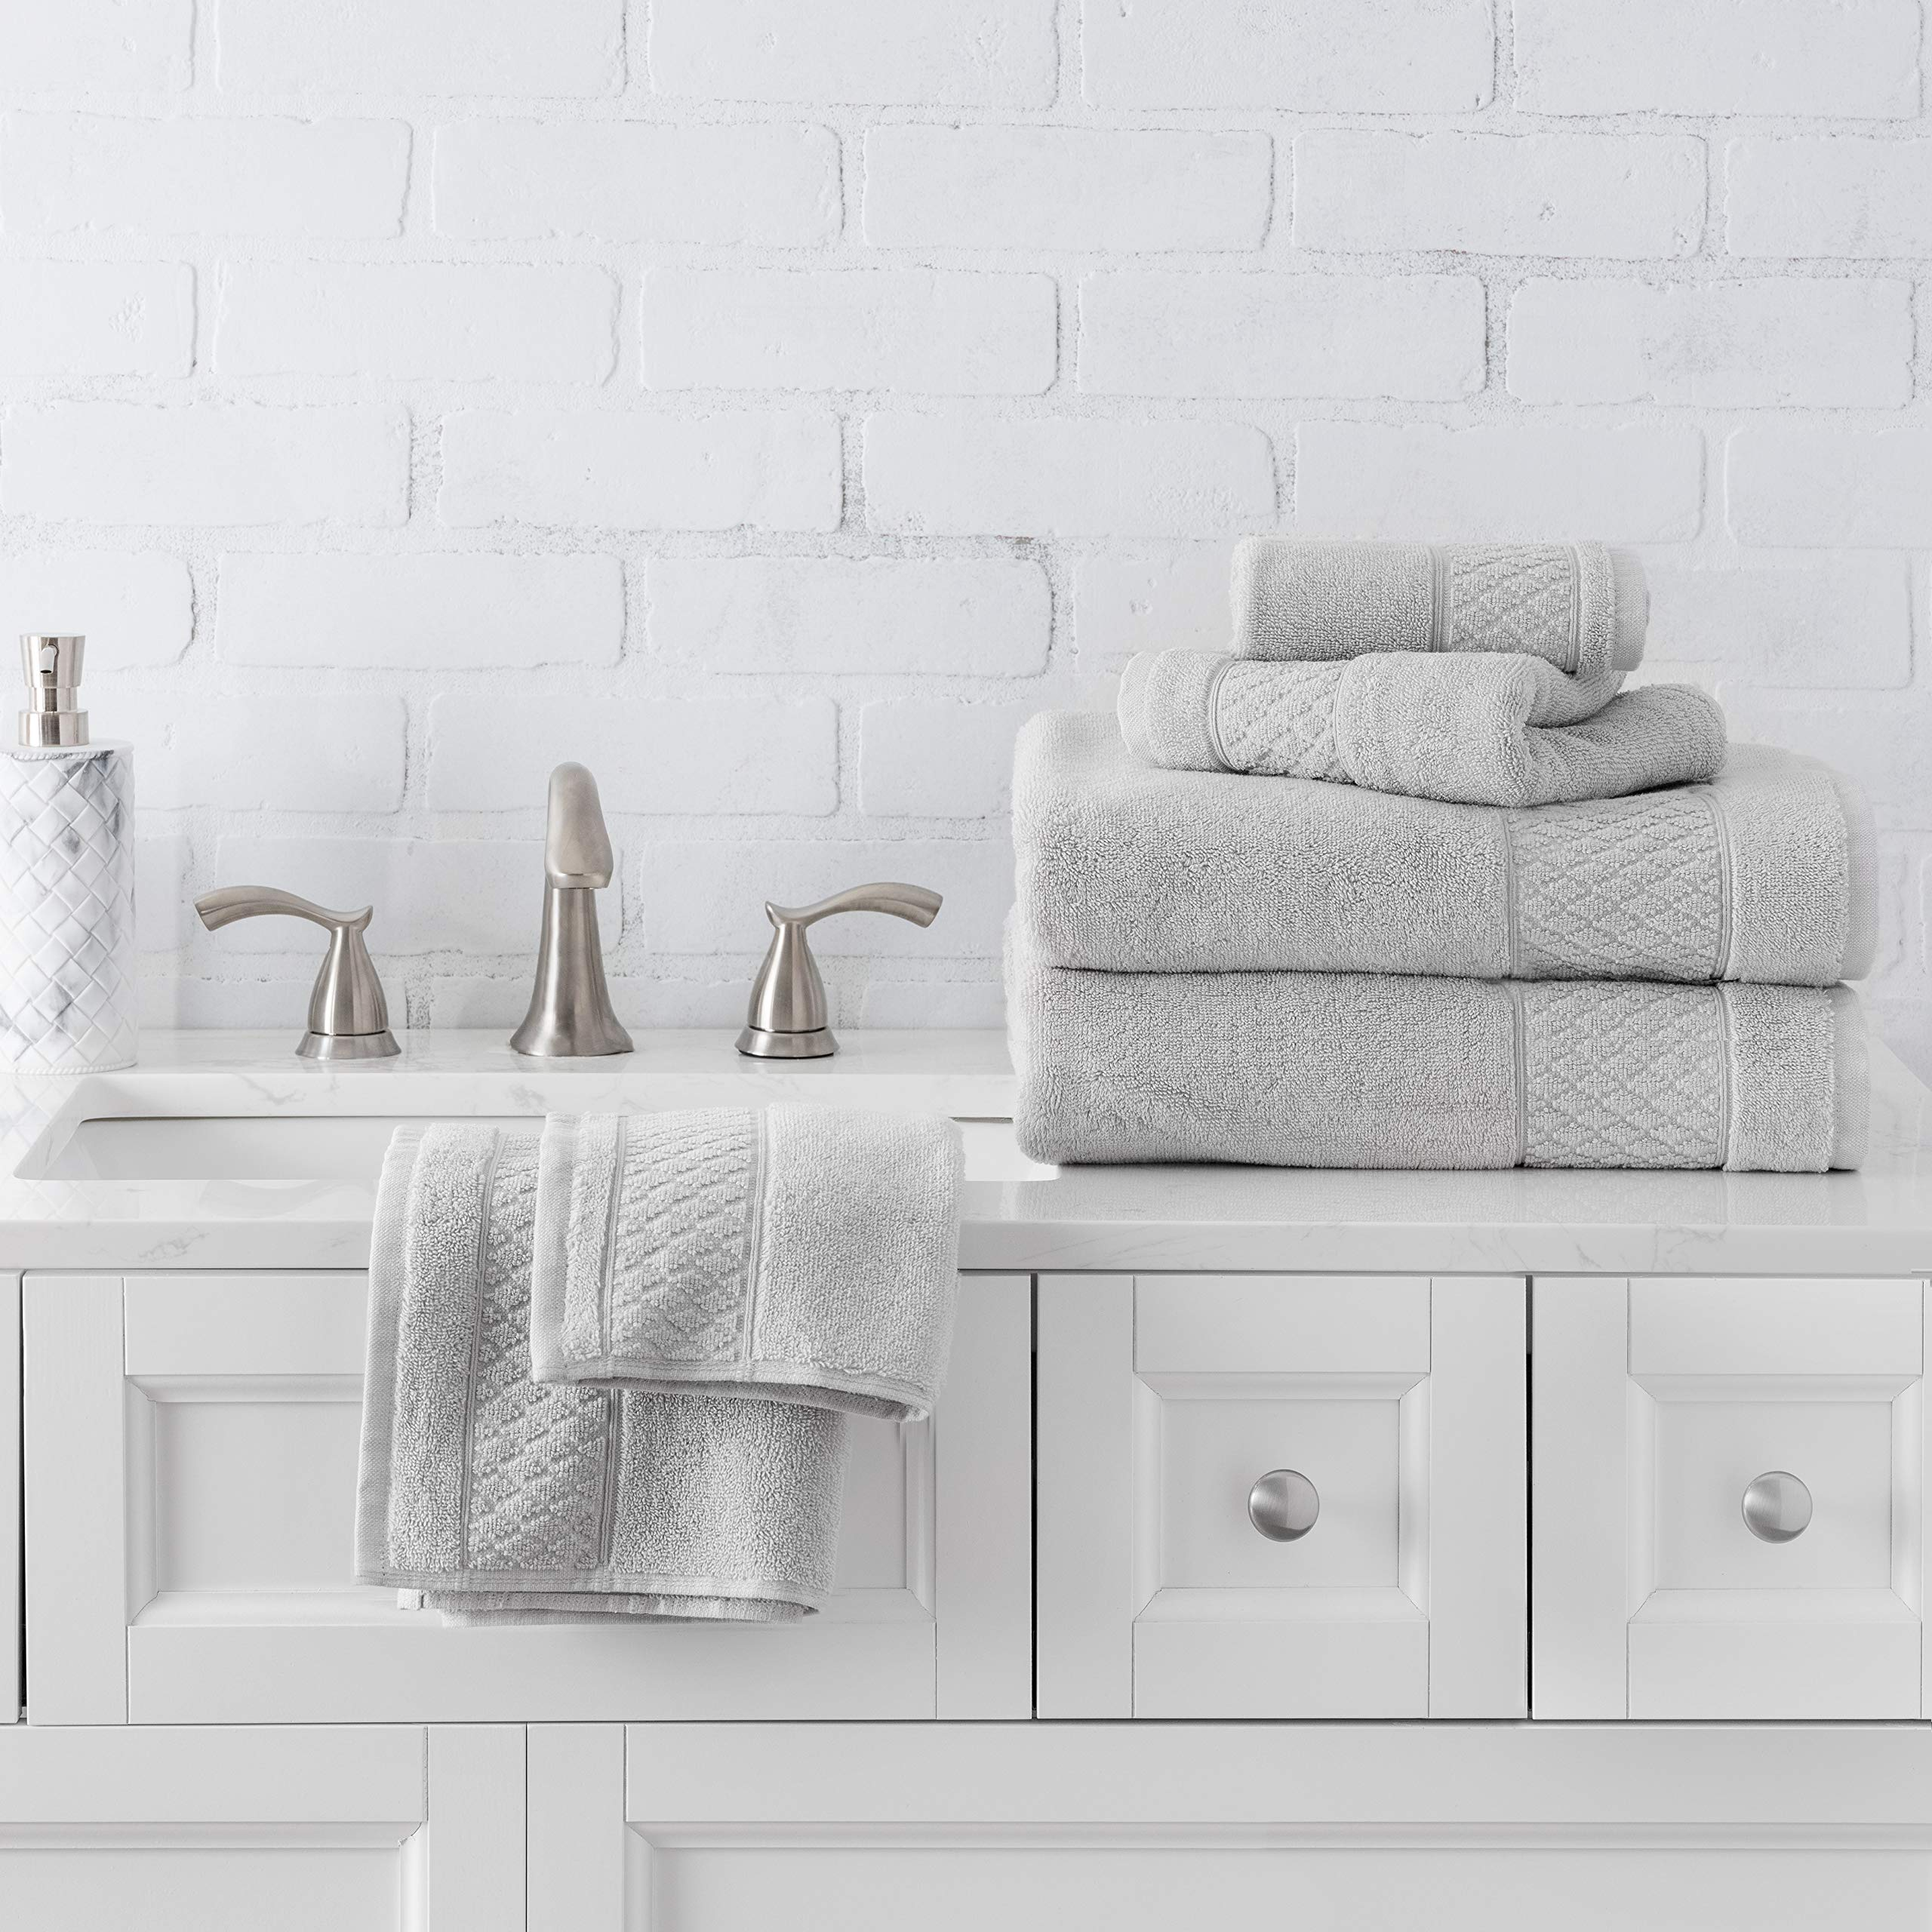 Welhome Hudson 100% Pure Organic Cotton 6 Piece Luxury Towel Set (Glacier Grey) Durable - High Absorbency - Hotel Spa Bathroom Towel Collection - 651 GSM - 2 Bath - 2 Hand - 2 Wash Towels